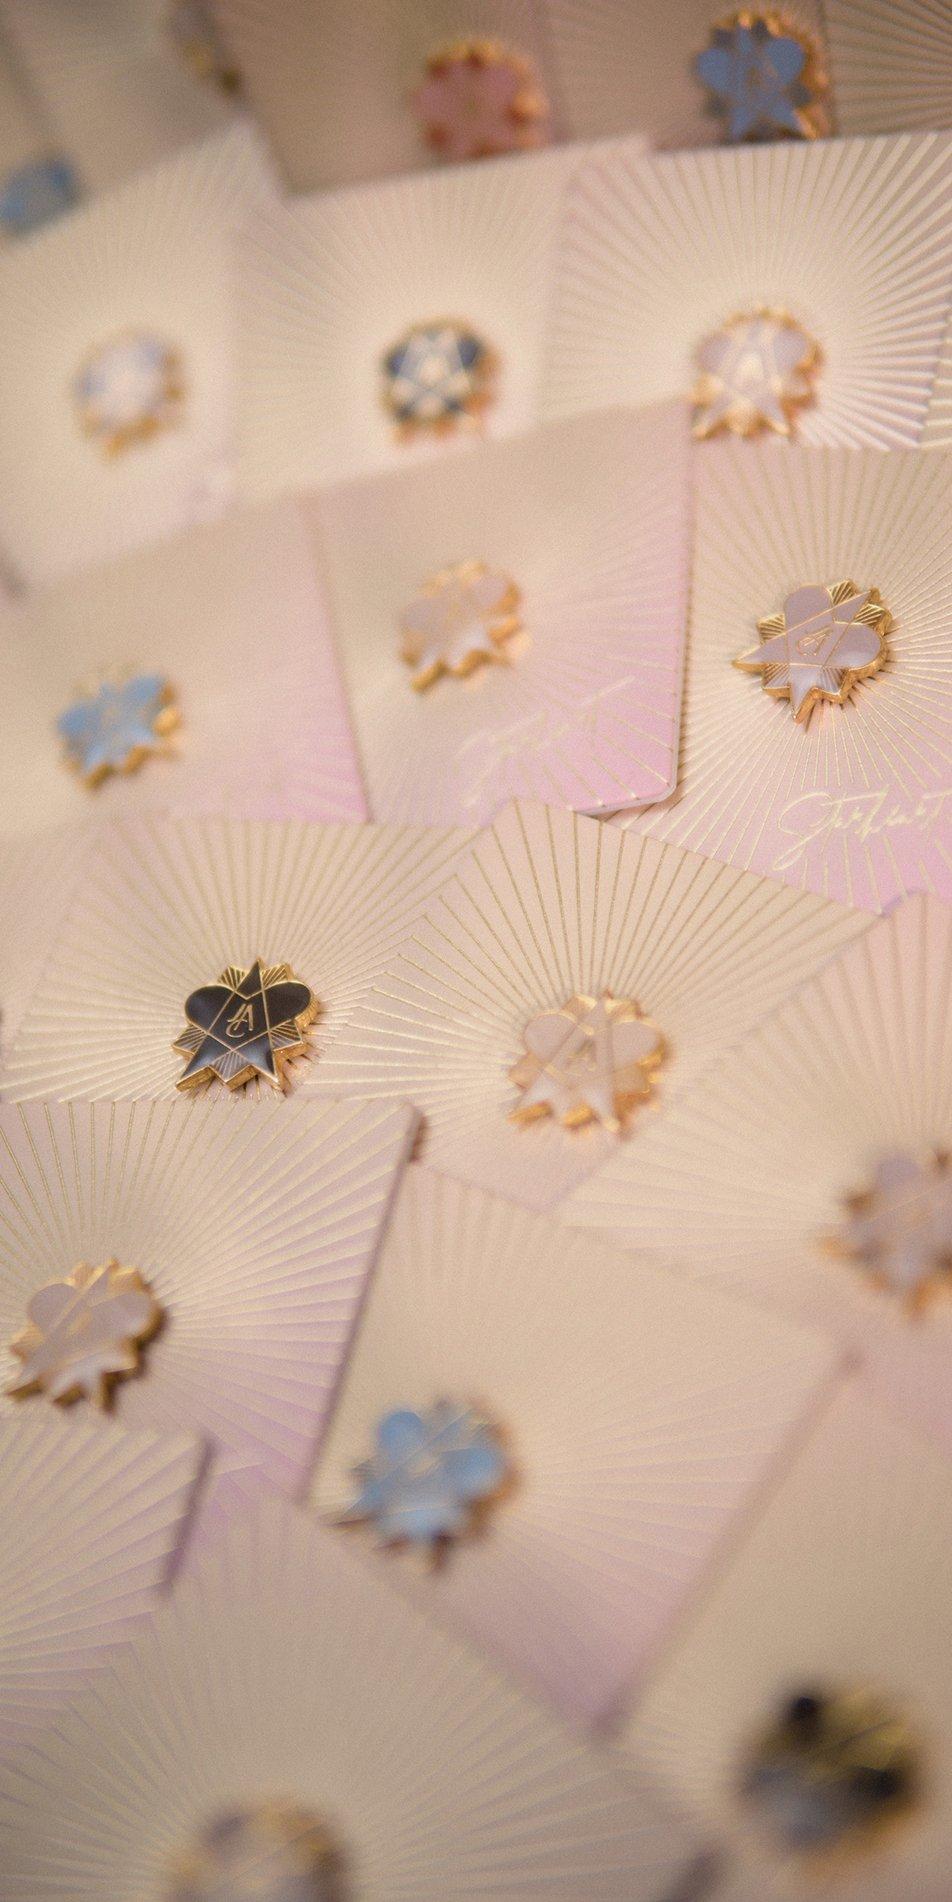 5 starheart pins 1 4